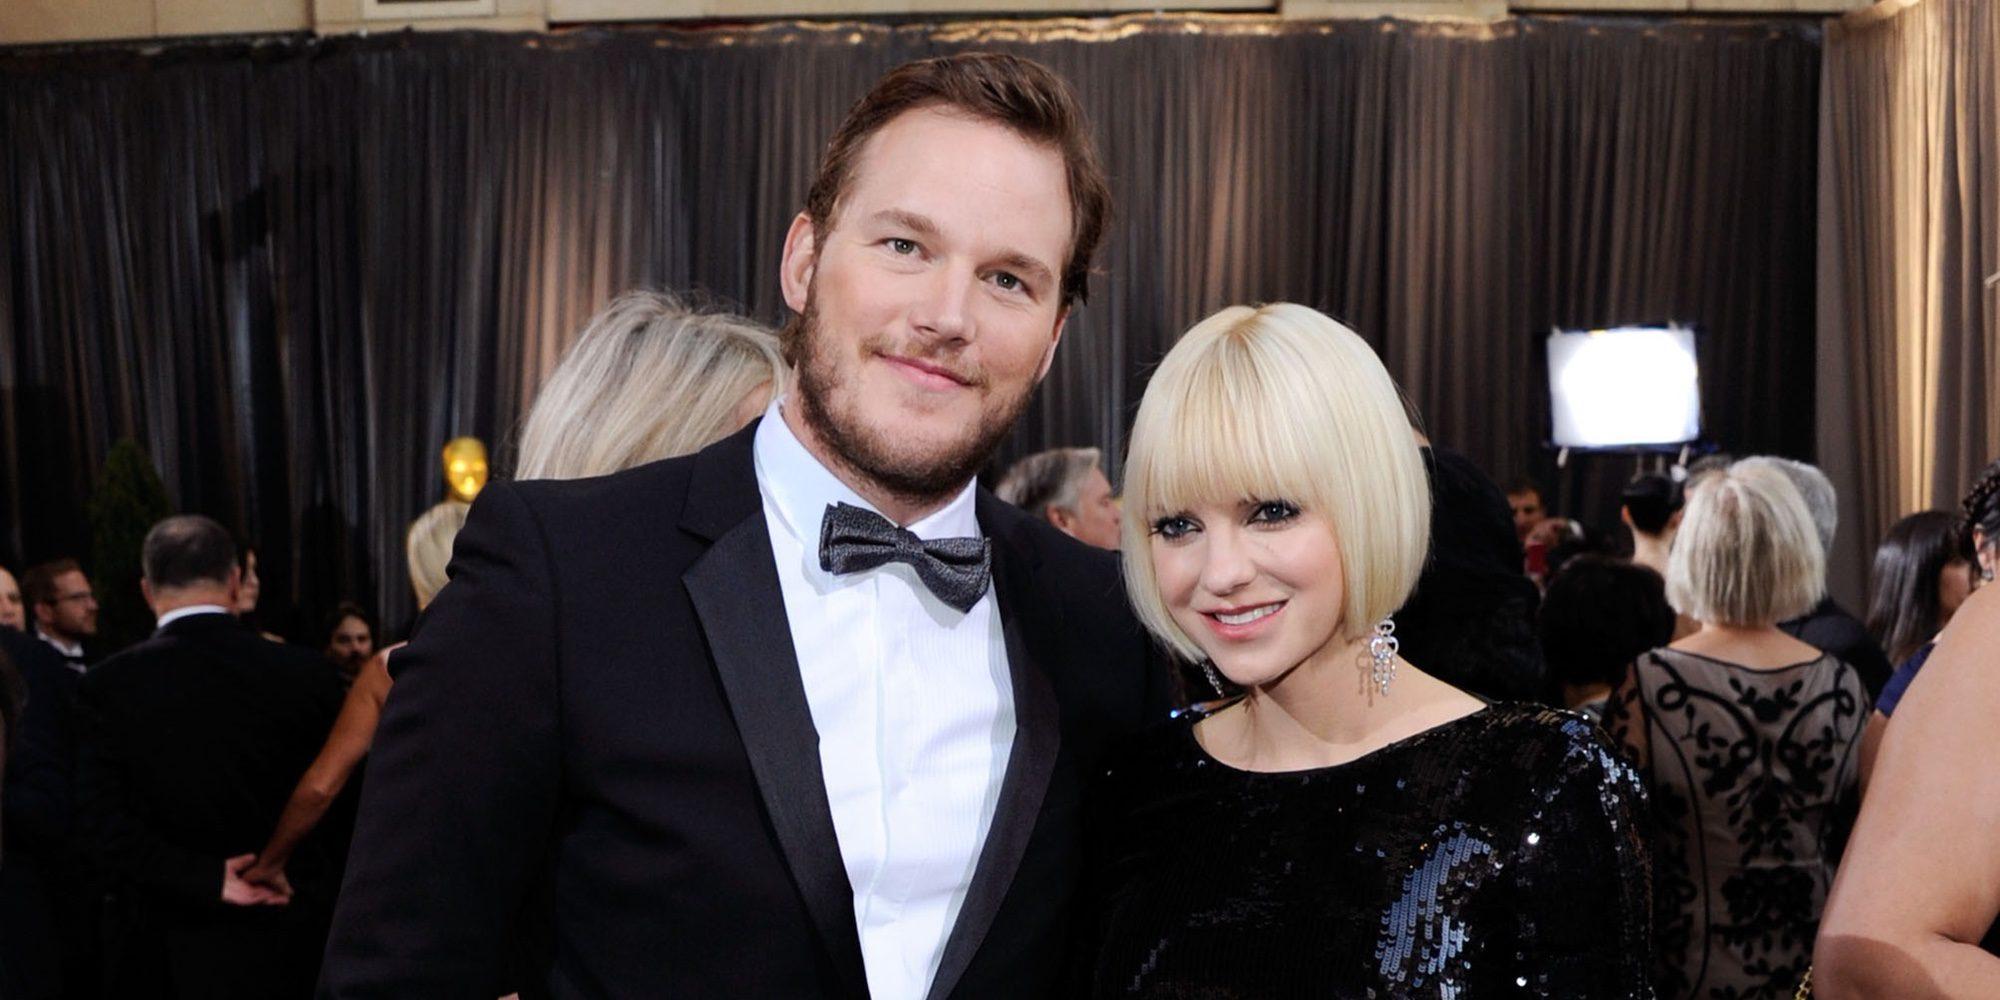 Chris Pratt aún vive junto a su exmujer Anna Faris según Patti Stanger